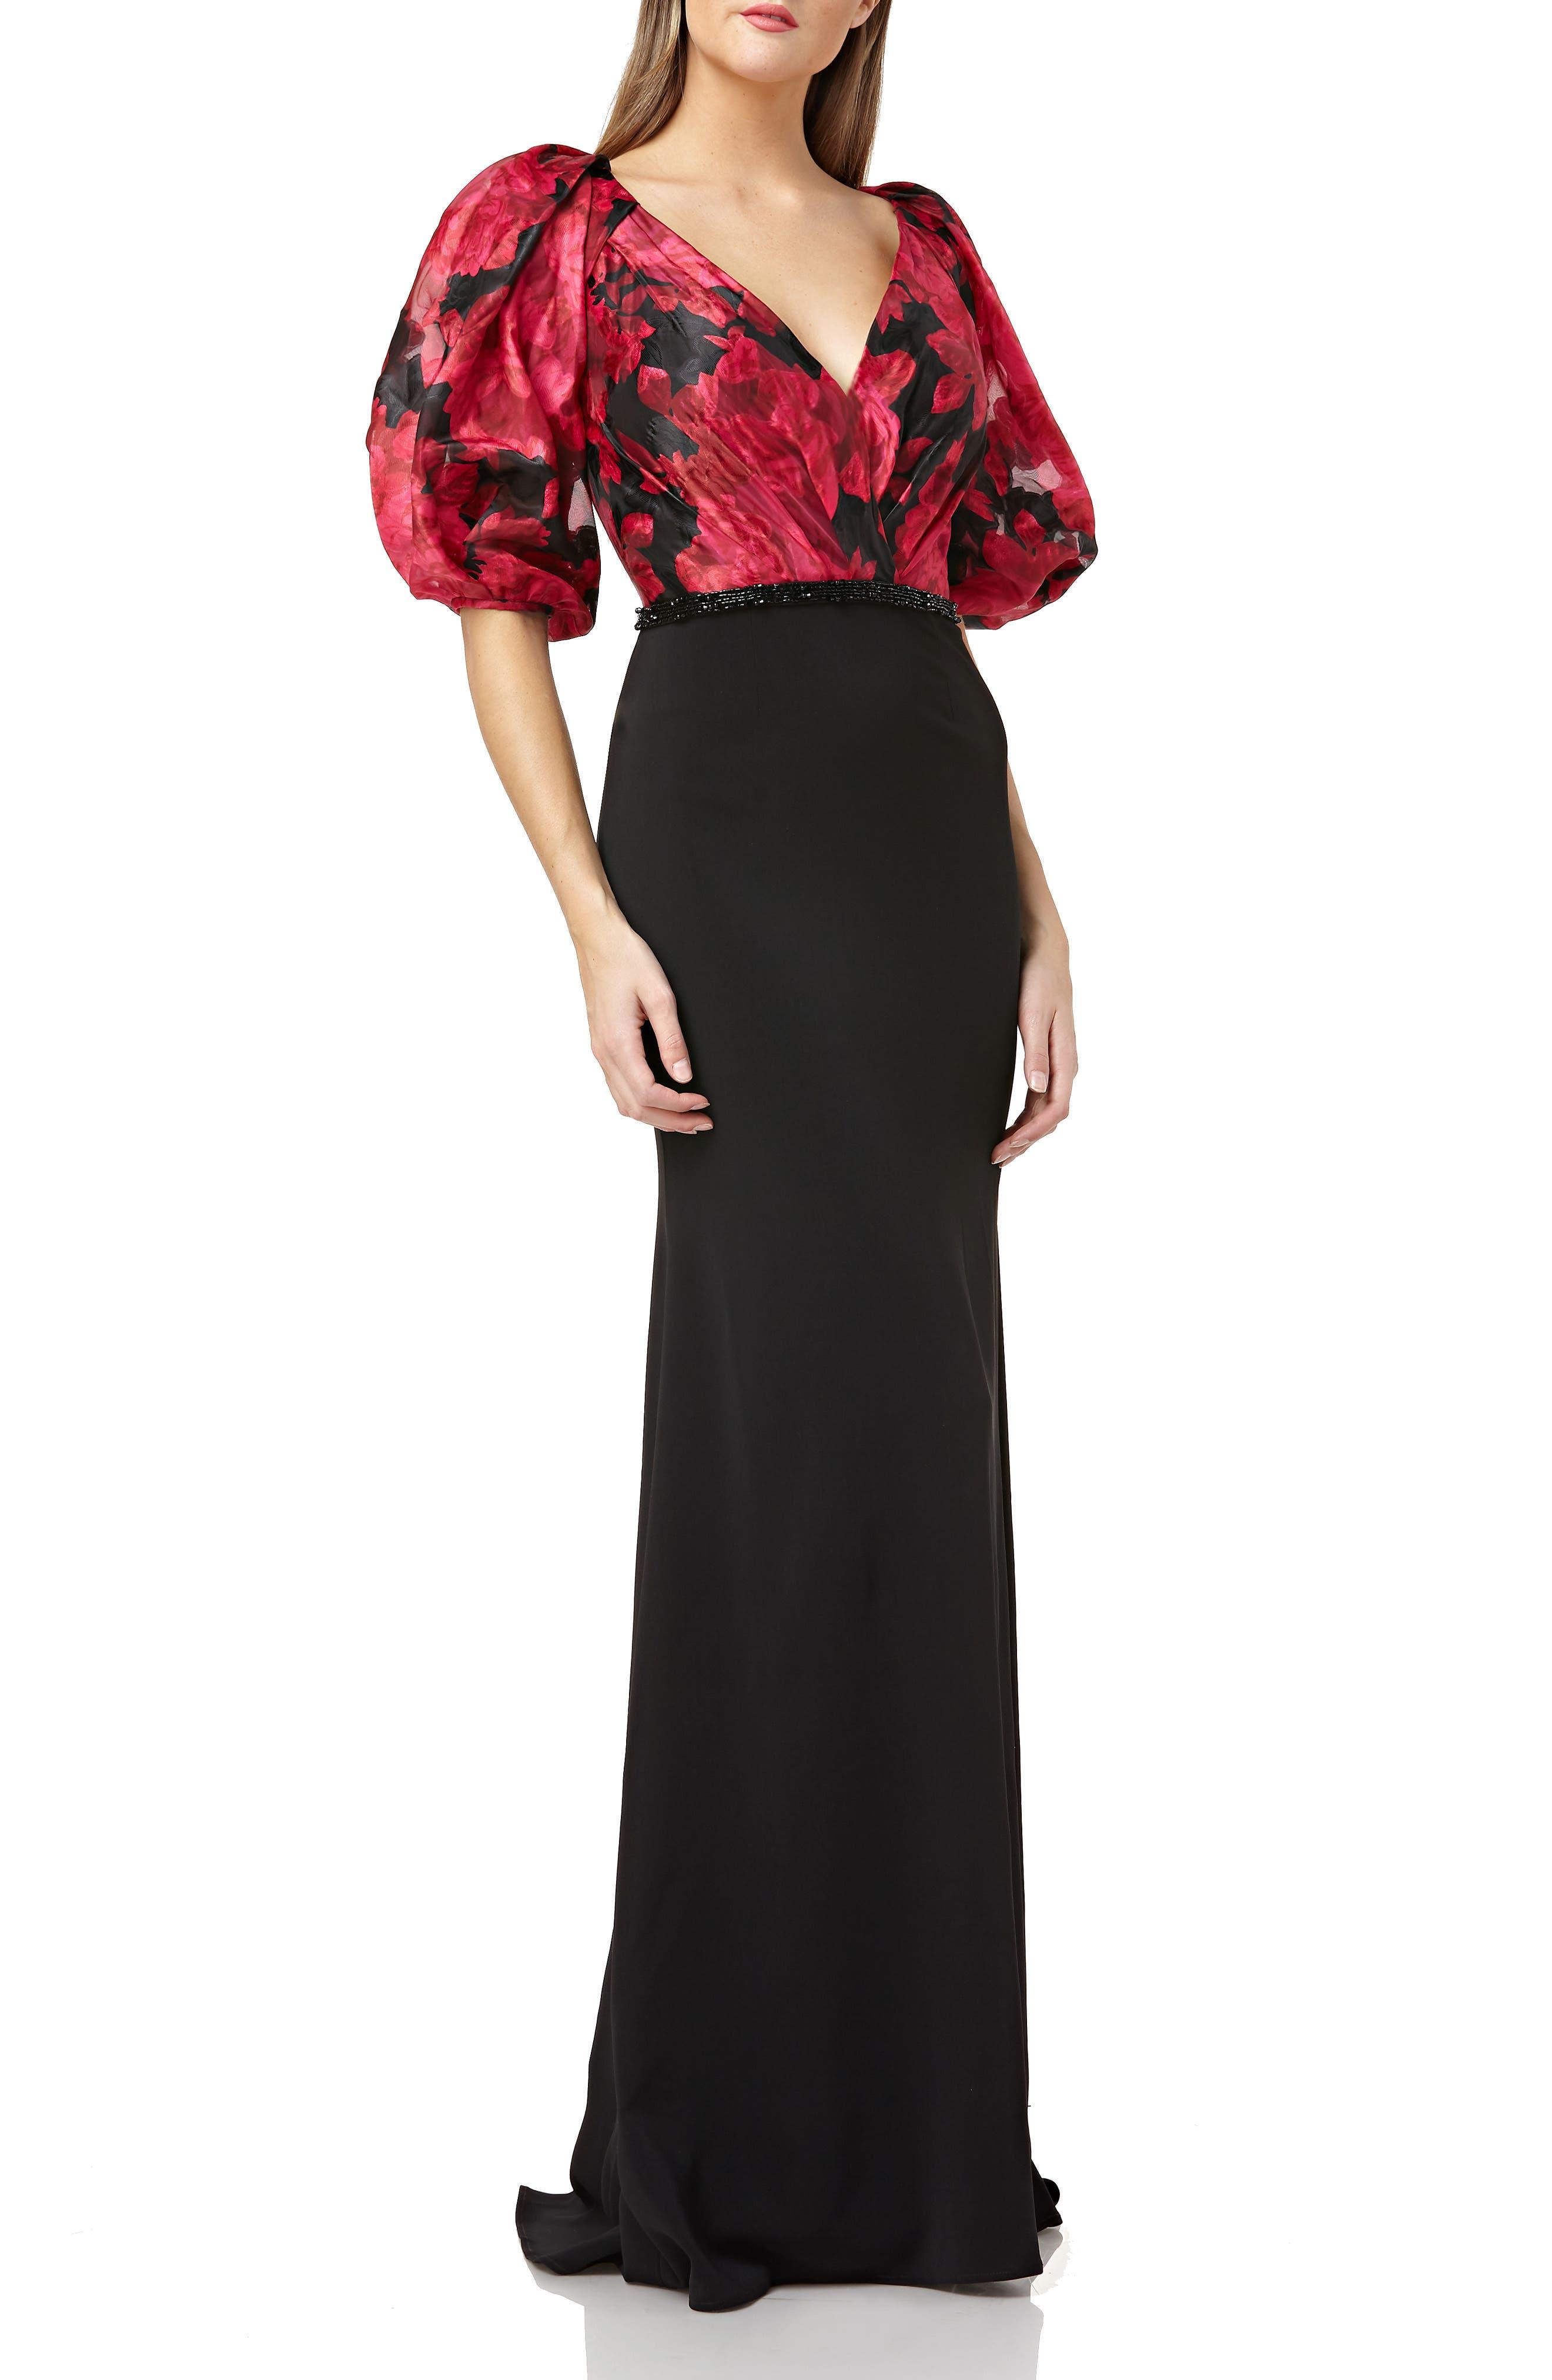 Carmen Marc Valvo Infusion Floral Print Organza Bodice Evening Dress, Black